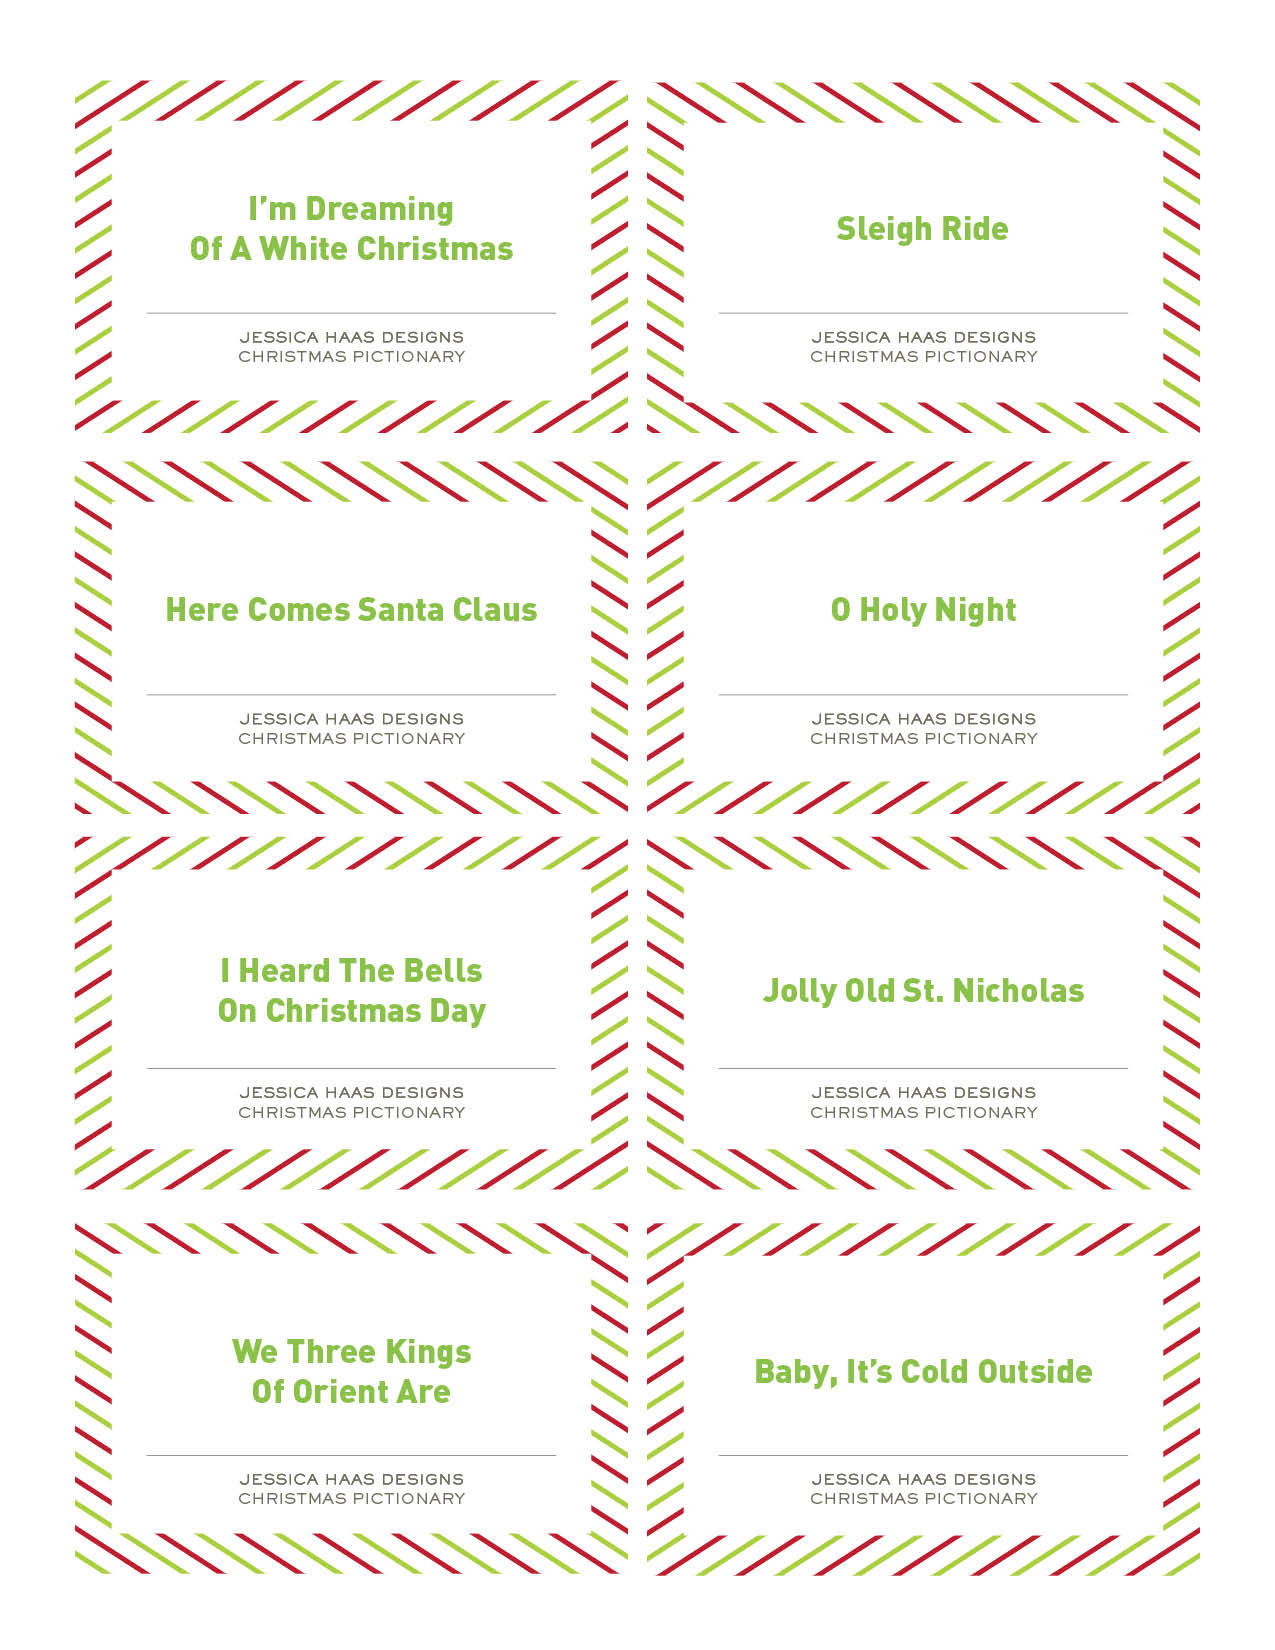 Christmas Pictionary.Free Christmas Pictionary Game